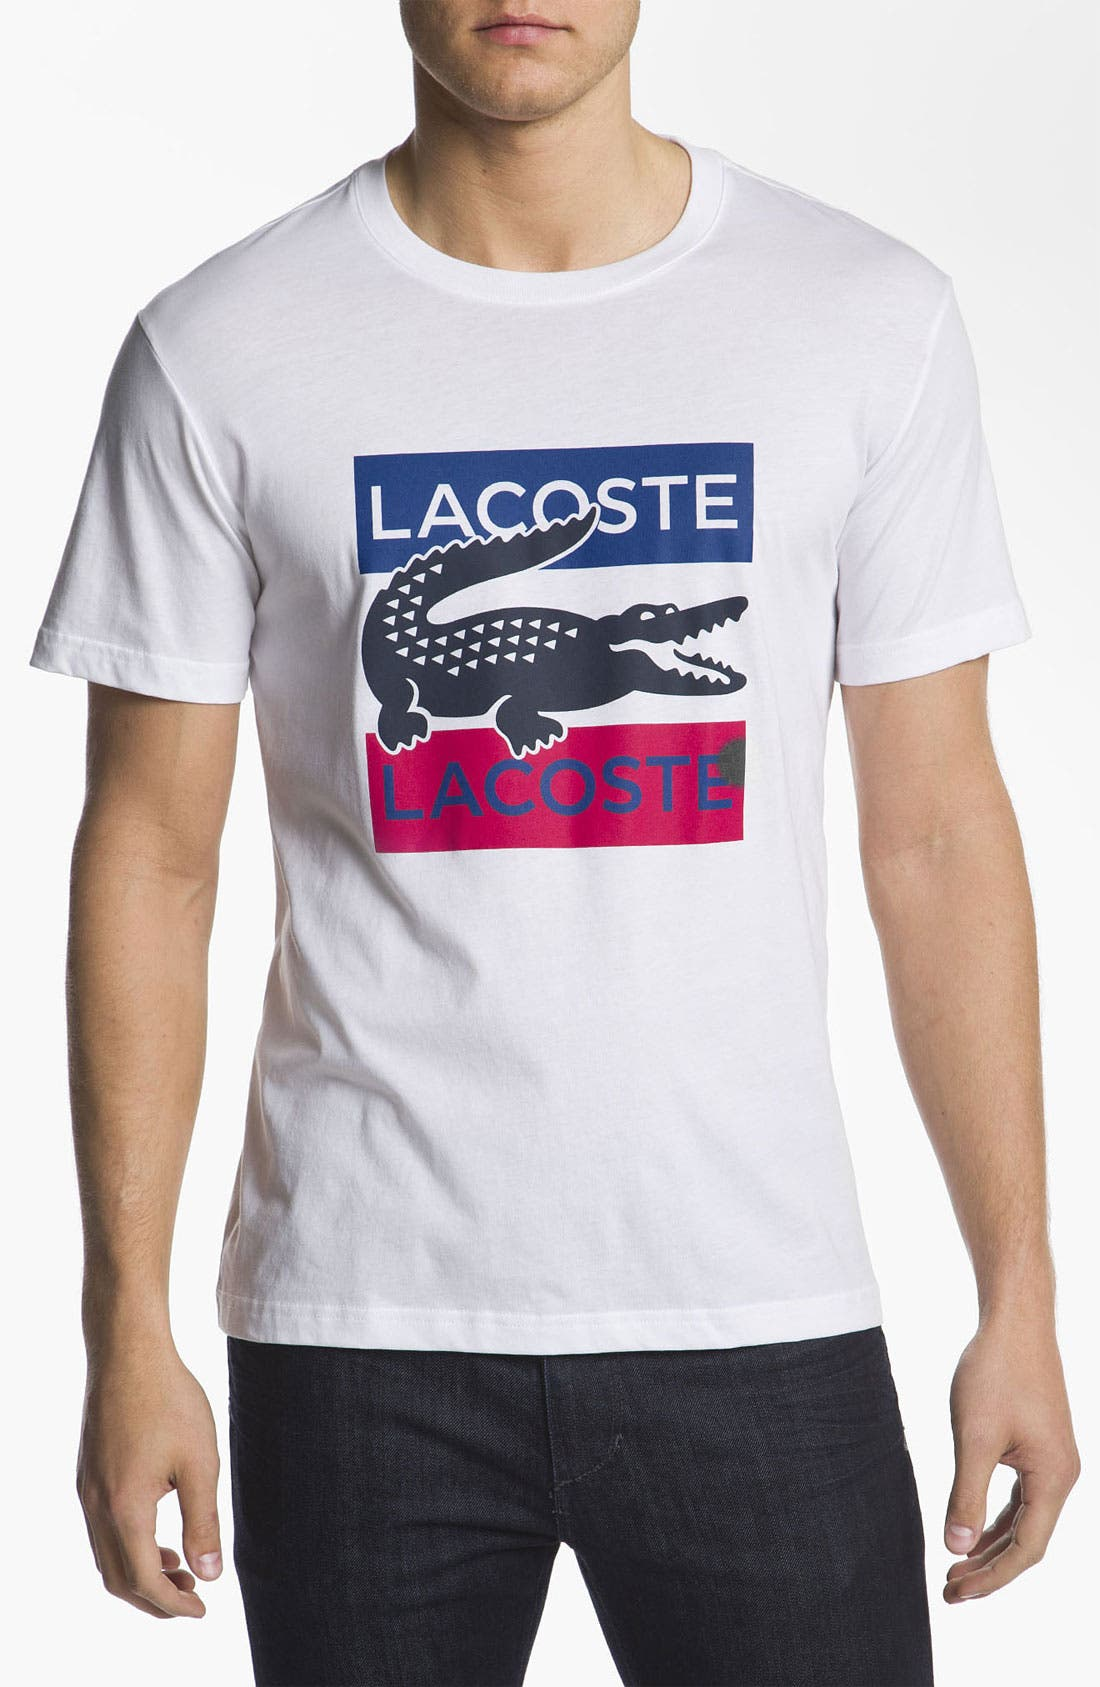 Alternate Image 1 Selected - Lacoste 'Croc' T-Shirt